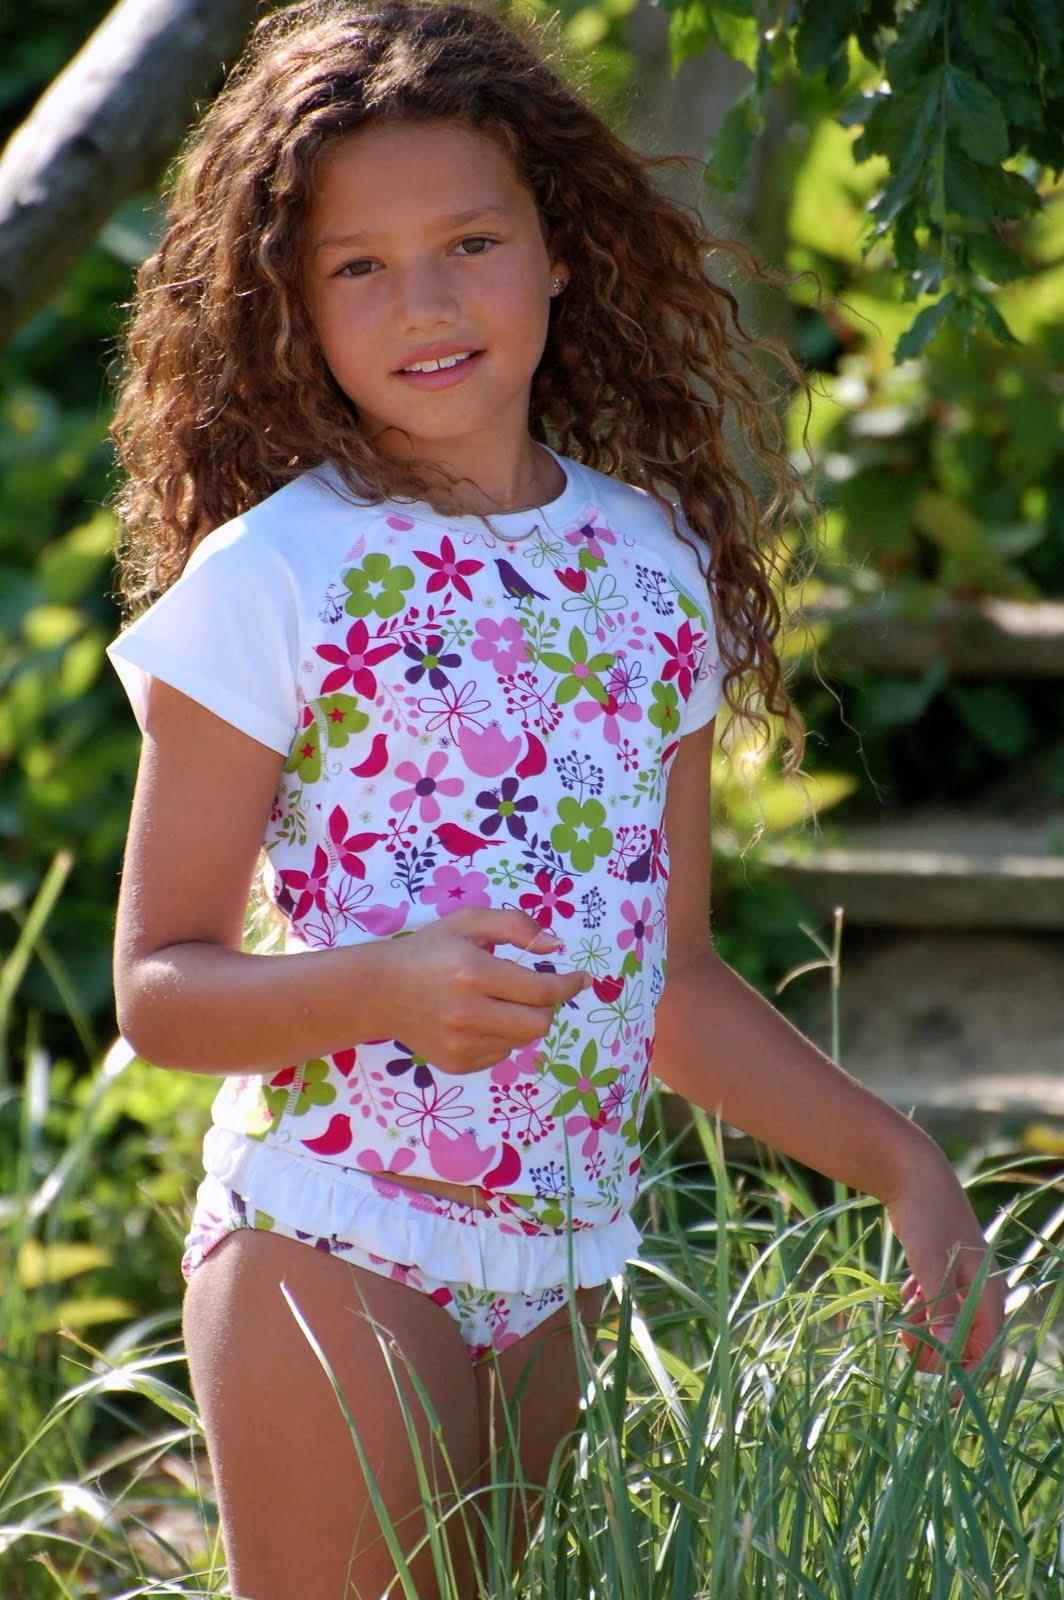 Leuke UV beschermende zwemkleding voor meisjes online bestellen